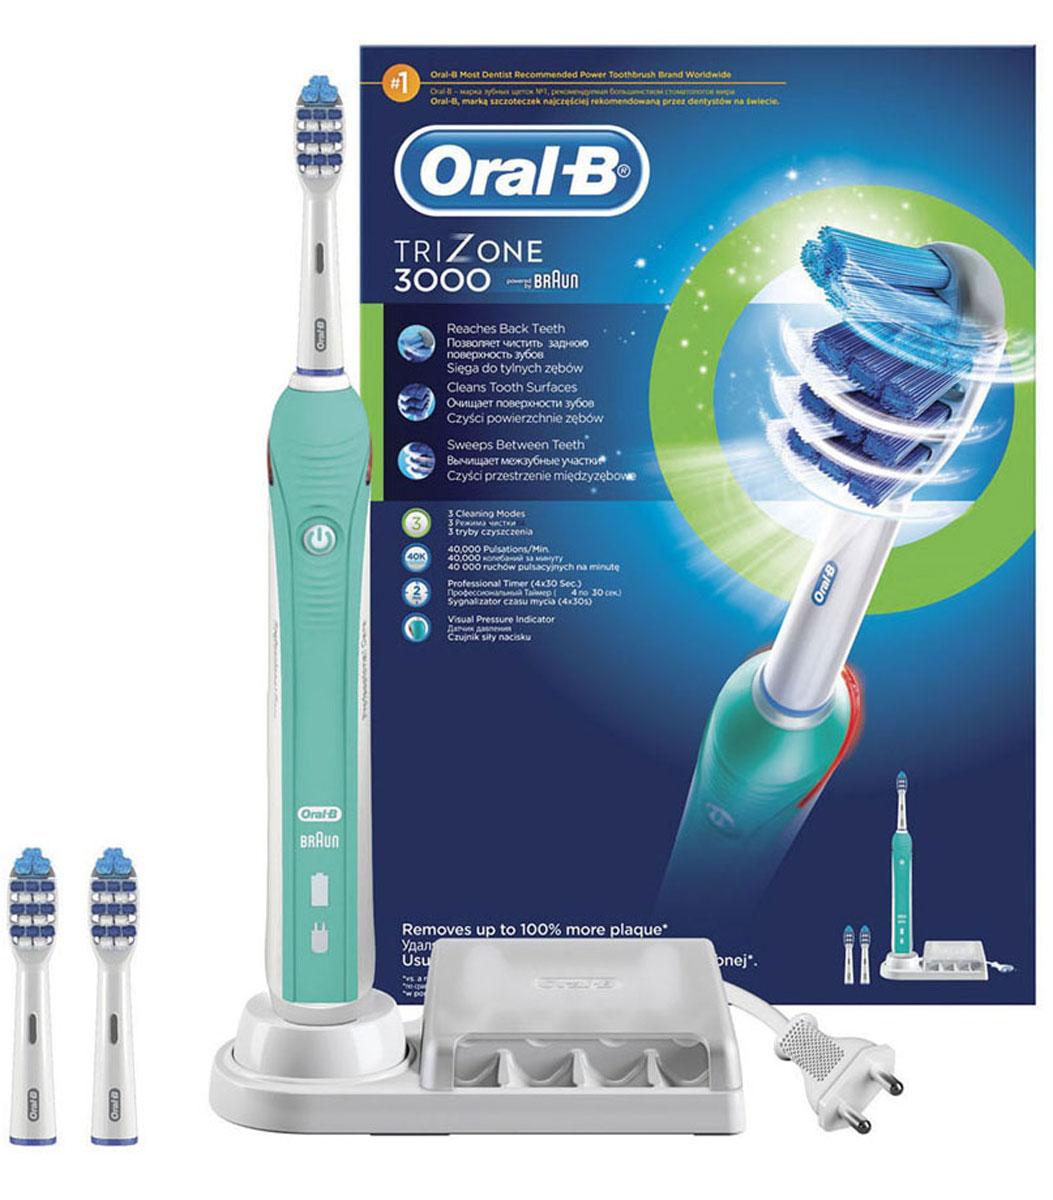 Электрическая зубная щетка Oral-B TriZone 3000